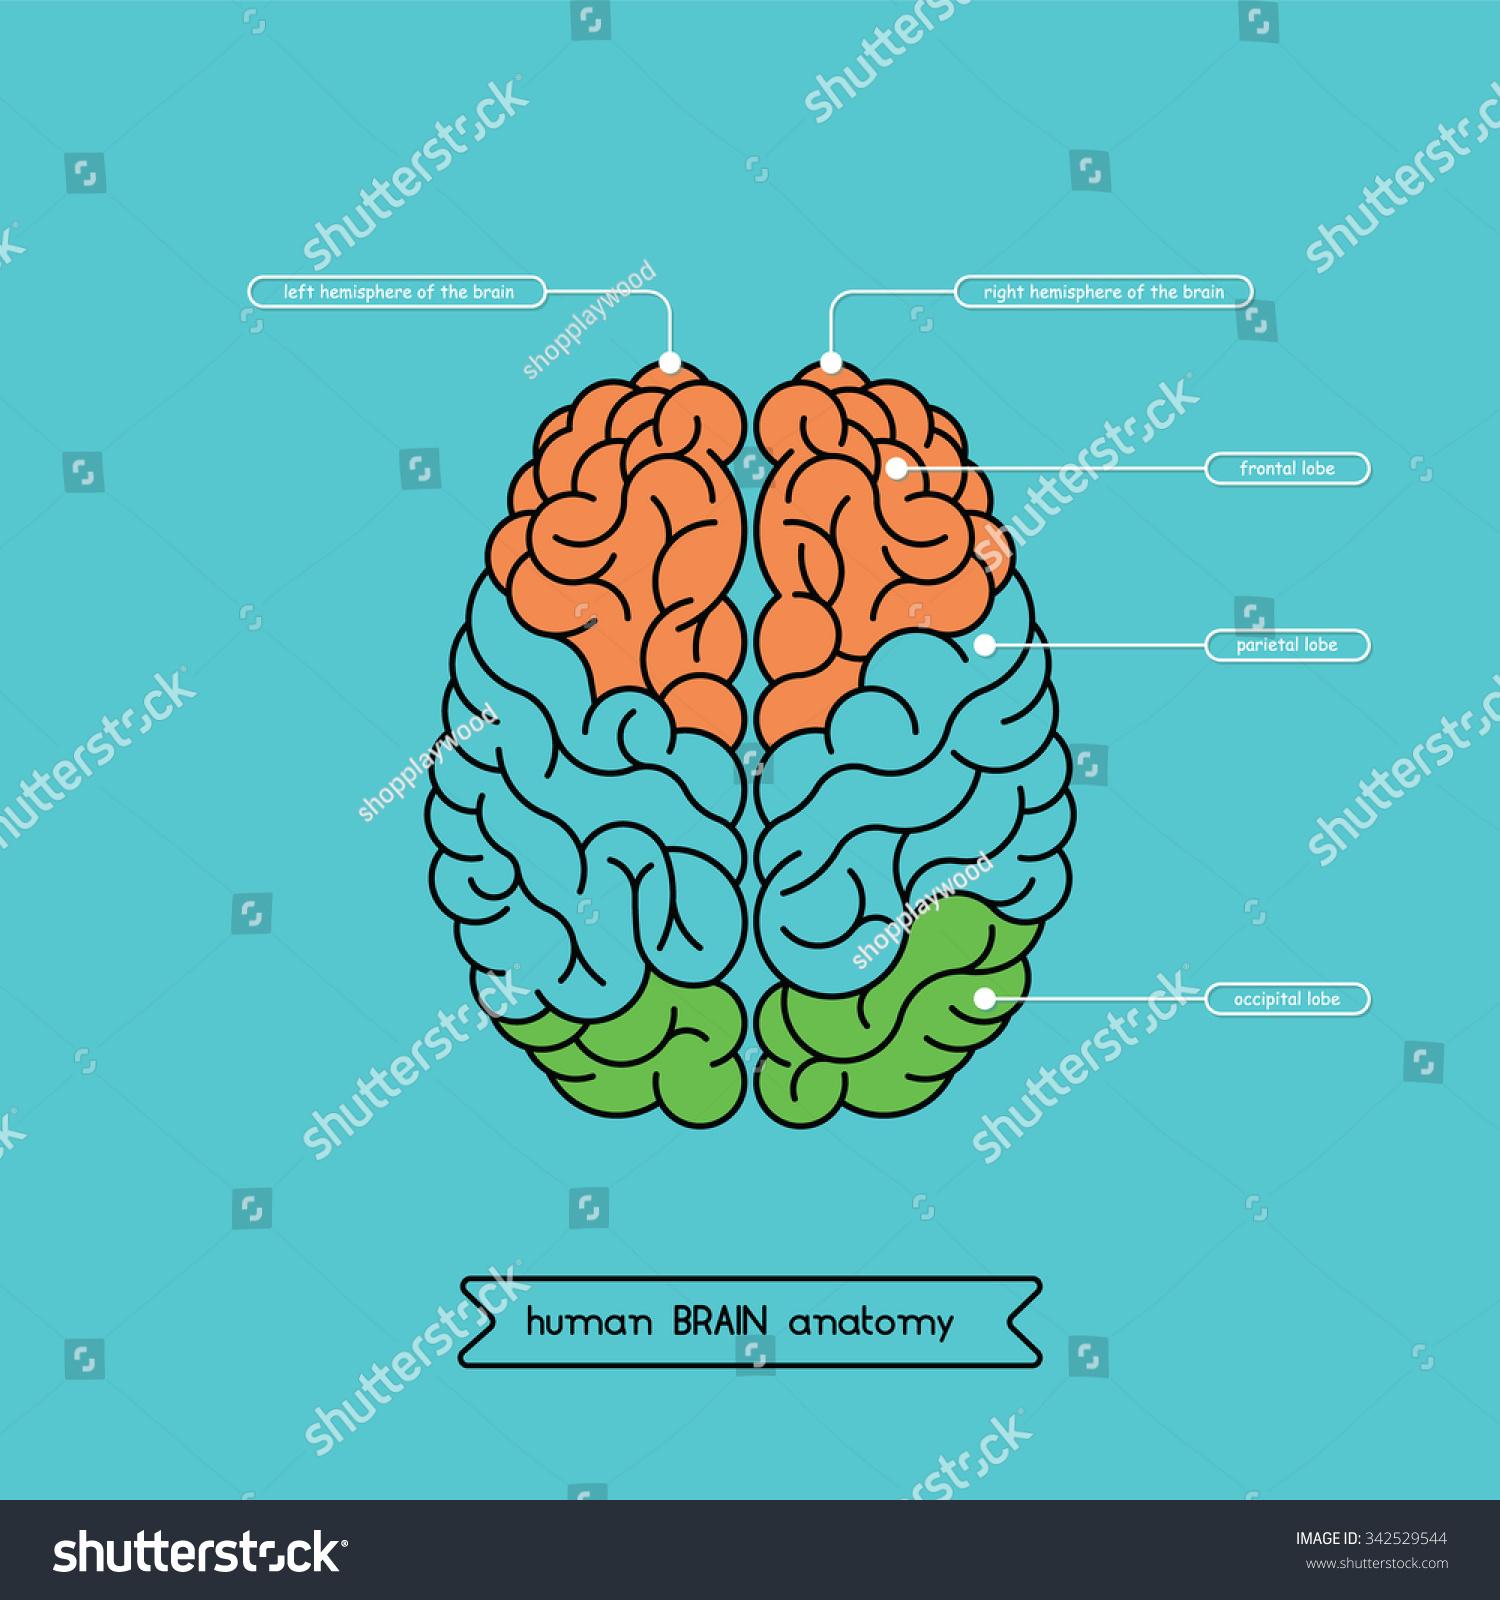 Human Brain Anatomy Structure Human Brain Stock Vector (Royalty Free ...